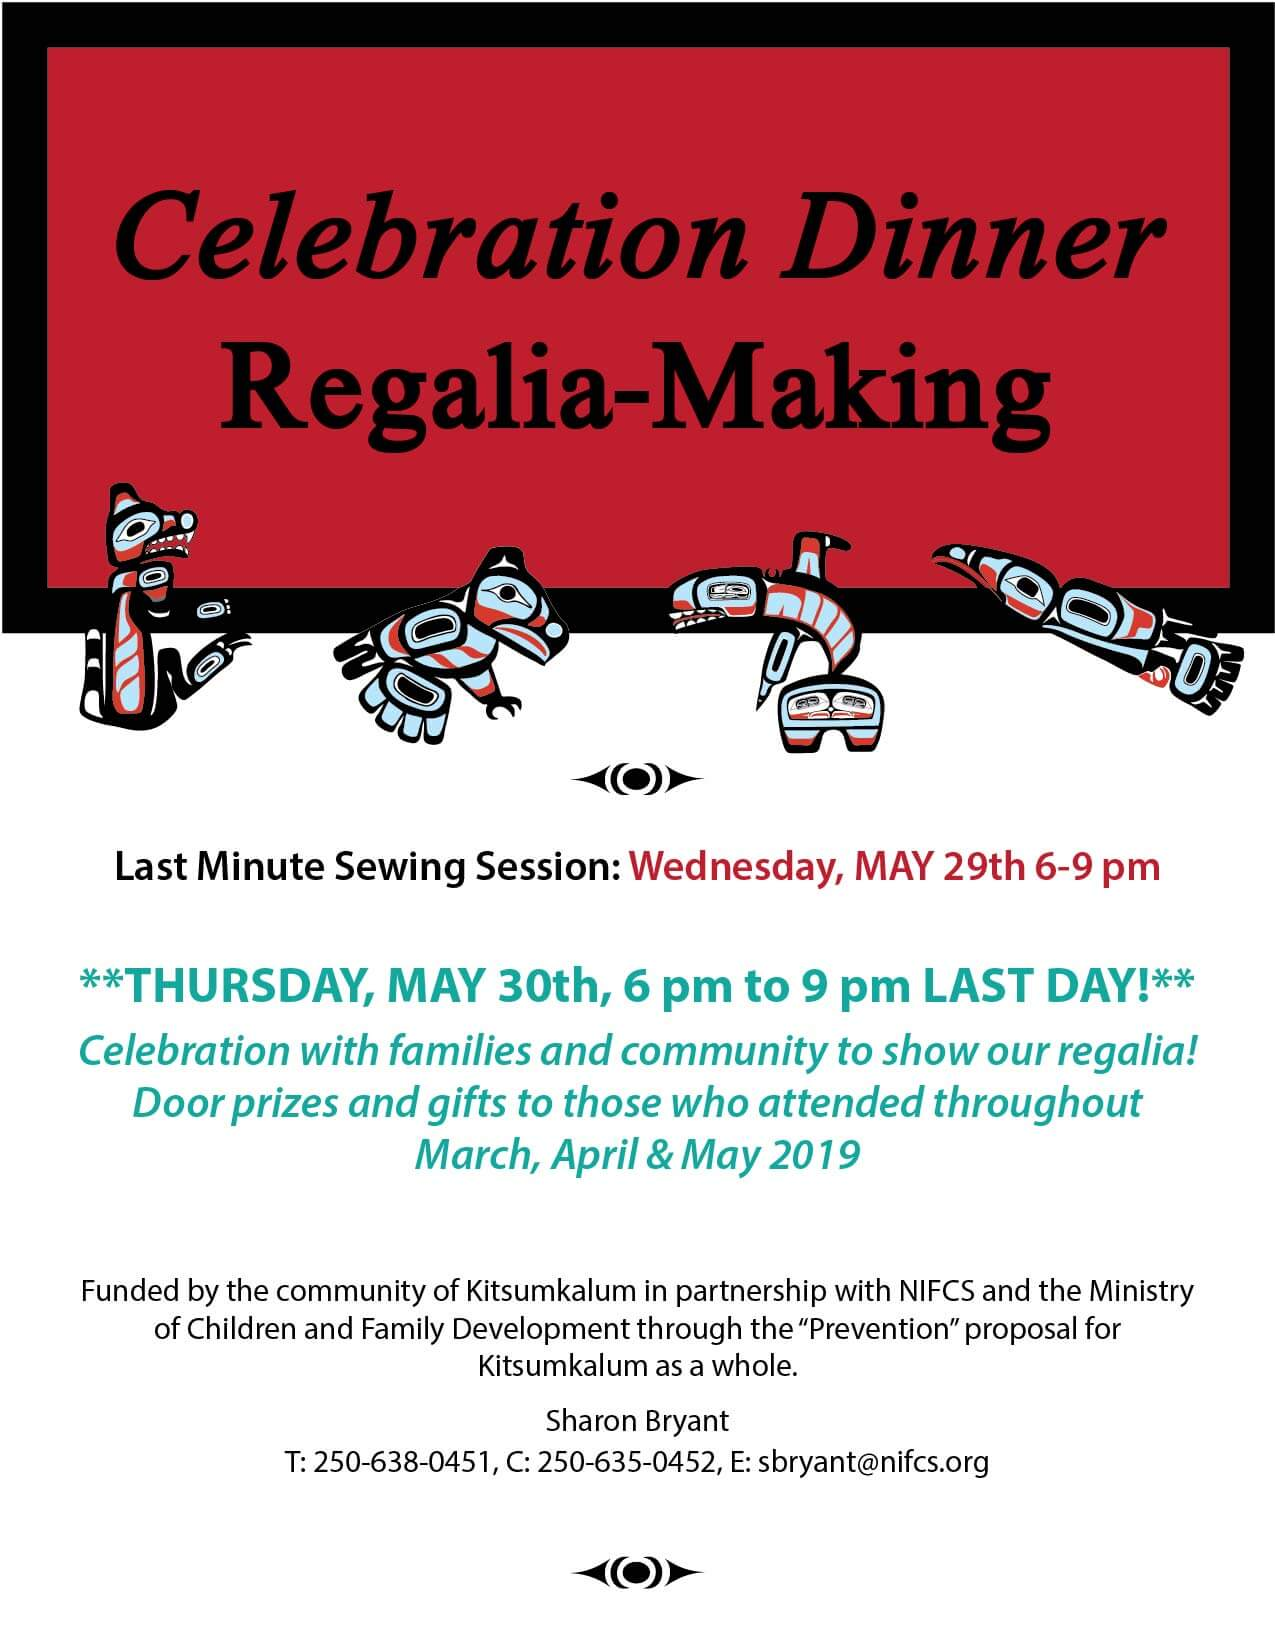 Celebration Dinner, Regalia Making MAY 30th